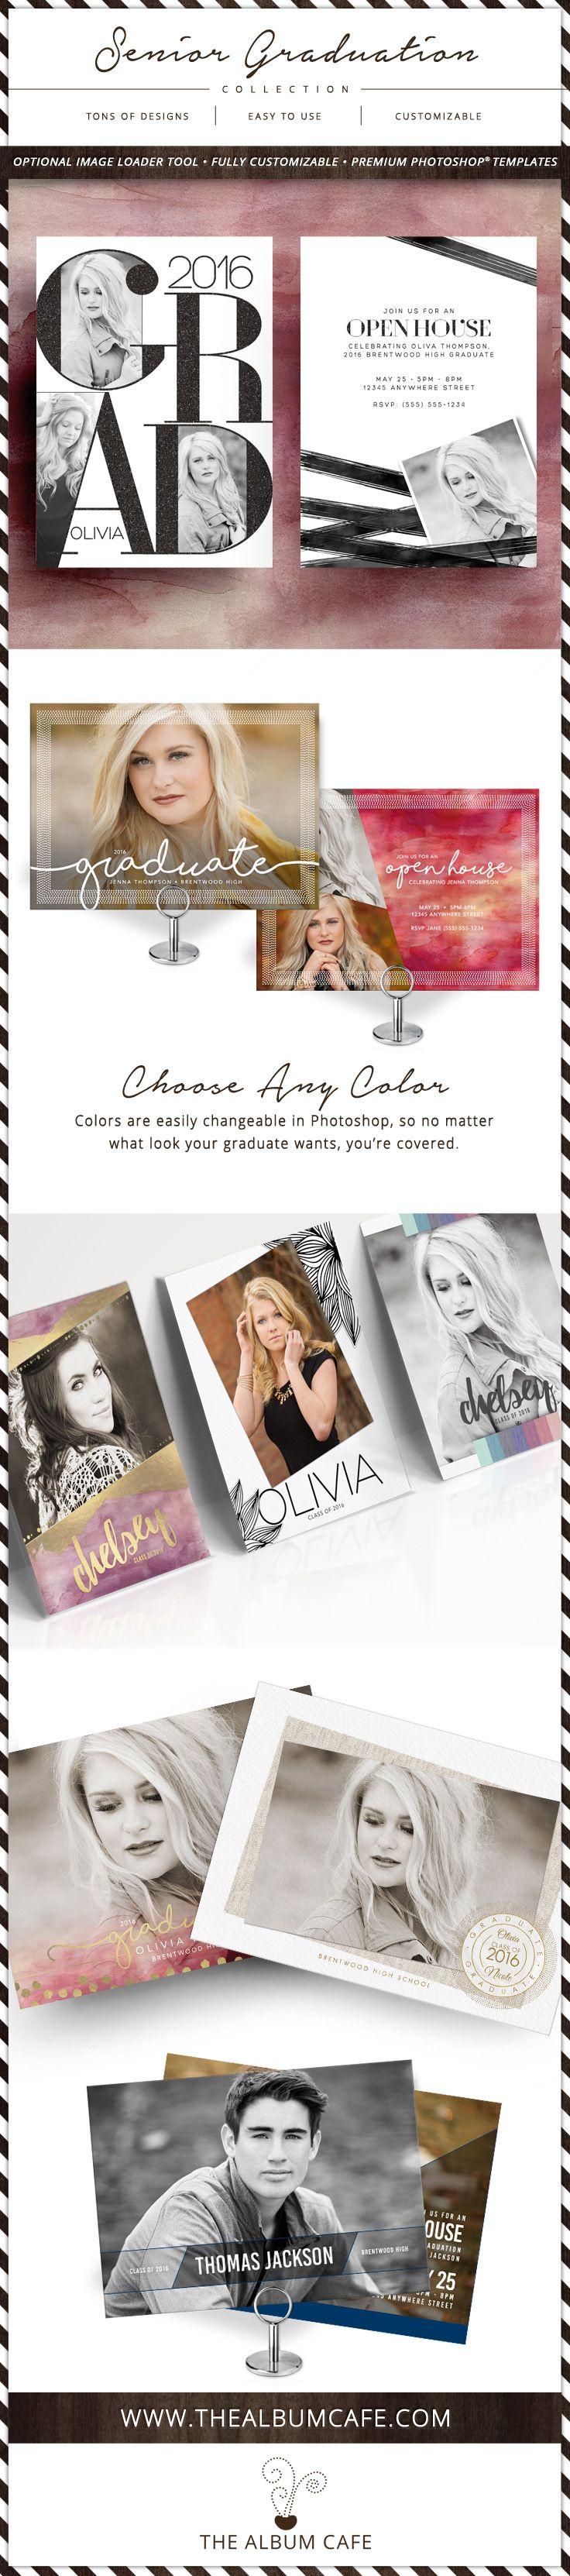 Senior Graduation Invitation Card Collection - Pro Photoshop Templates for Photographers